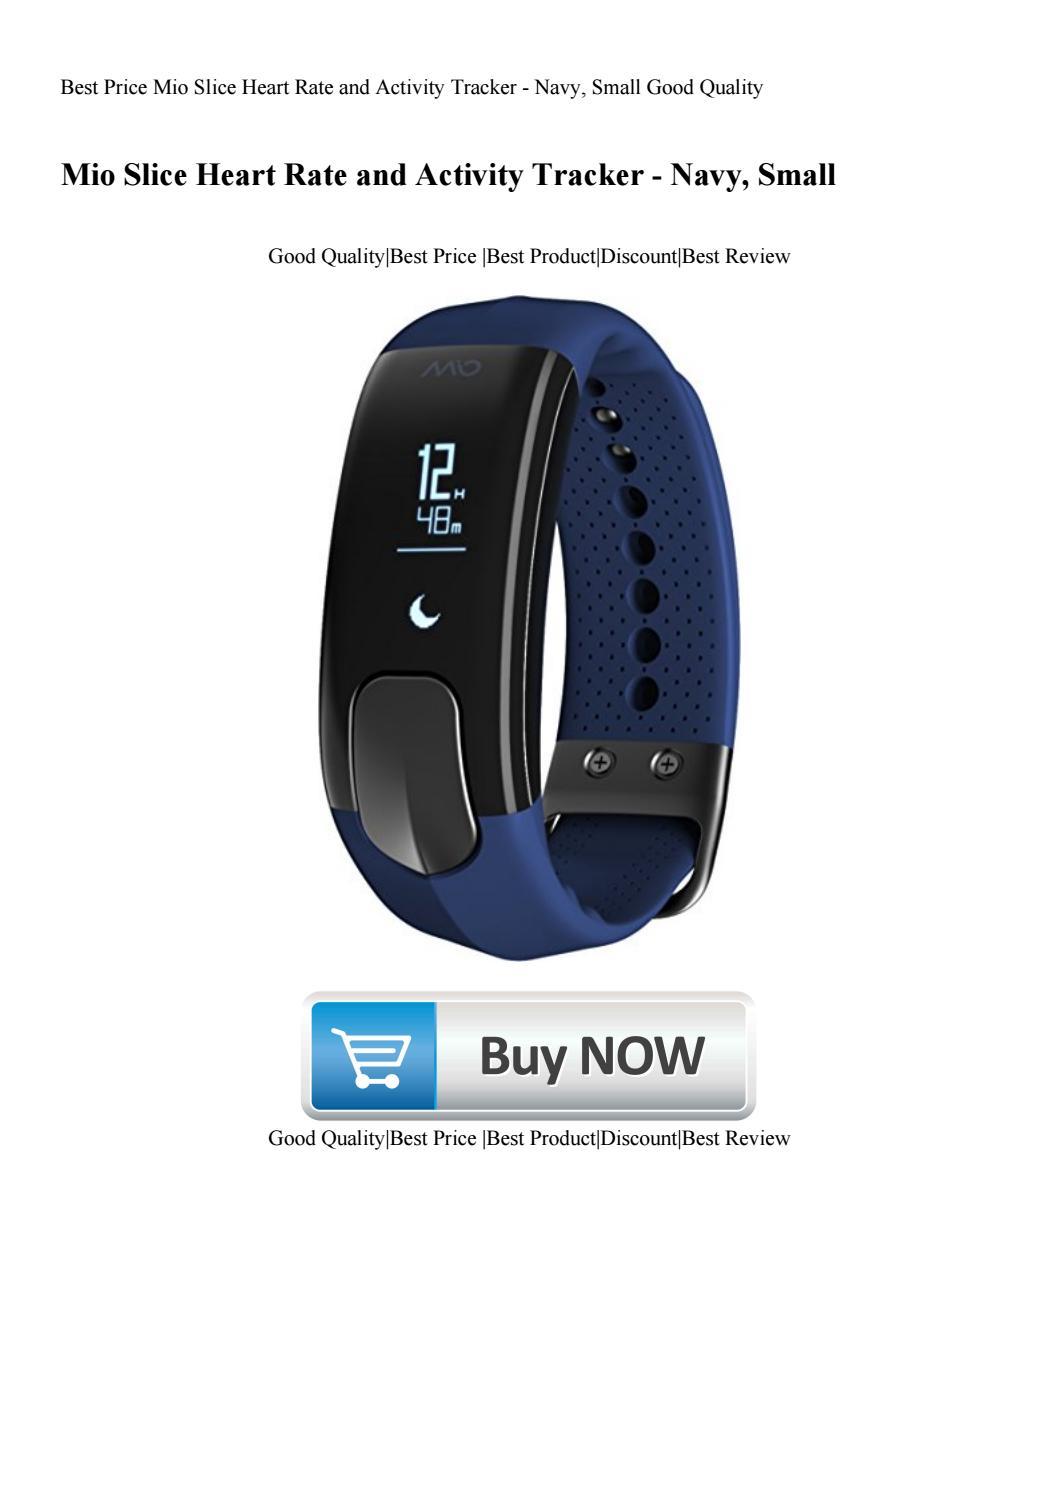 Mio Slice Heart Rate Activity Tracker